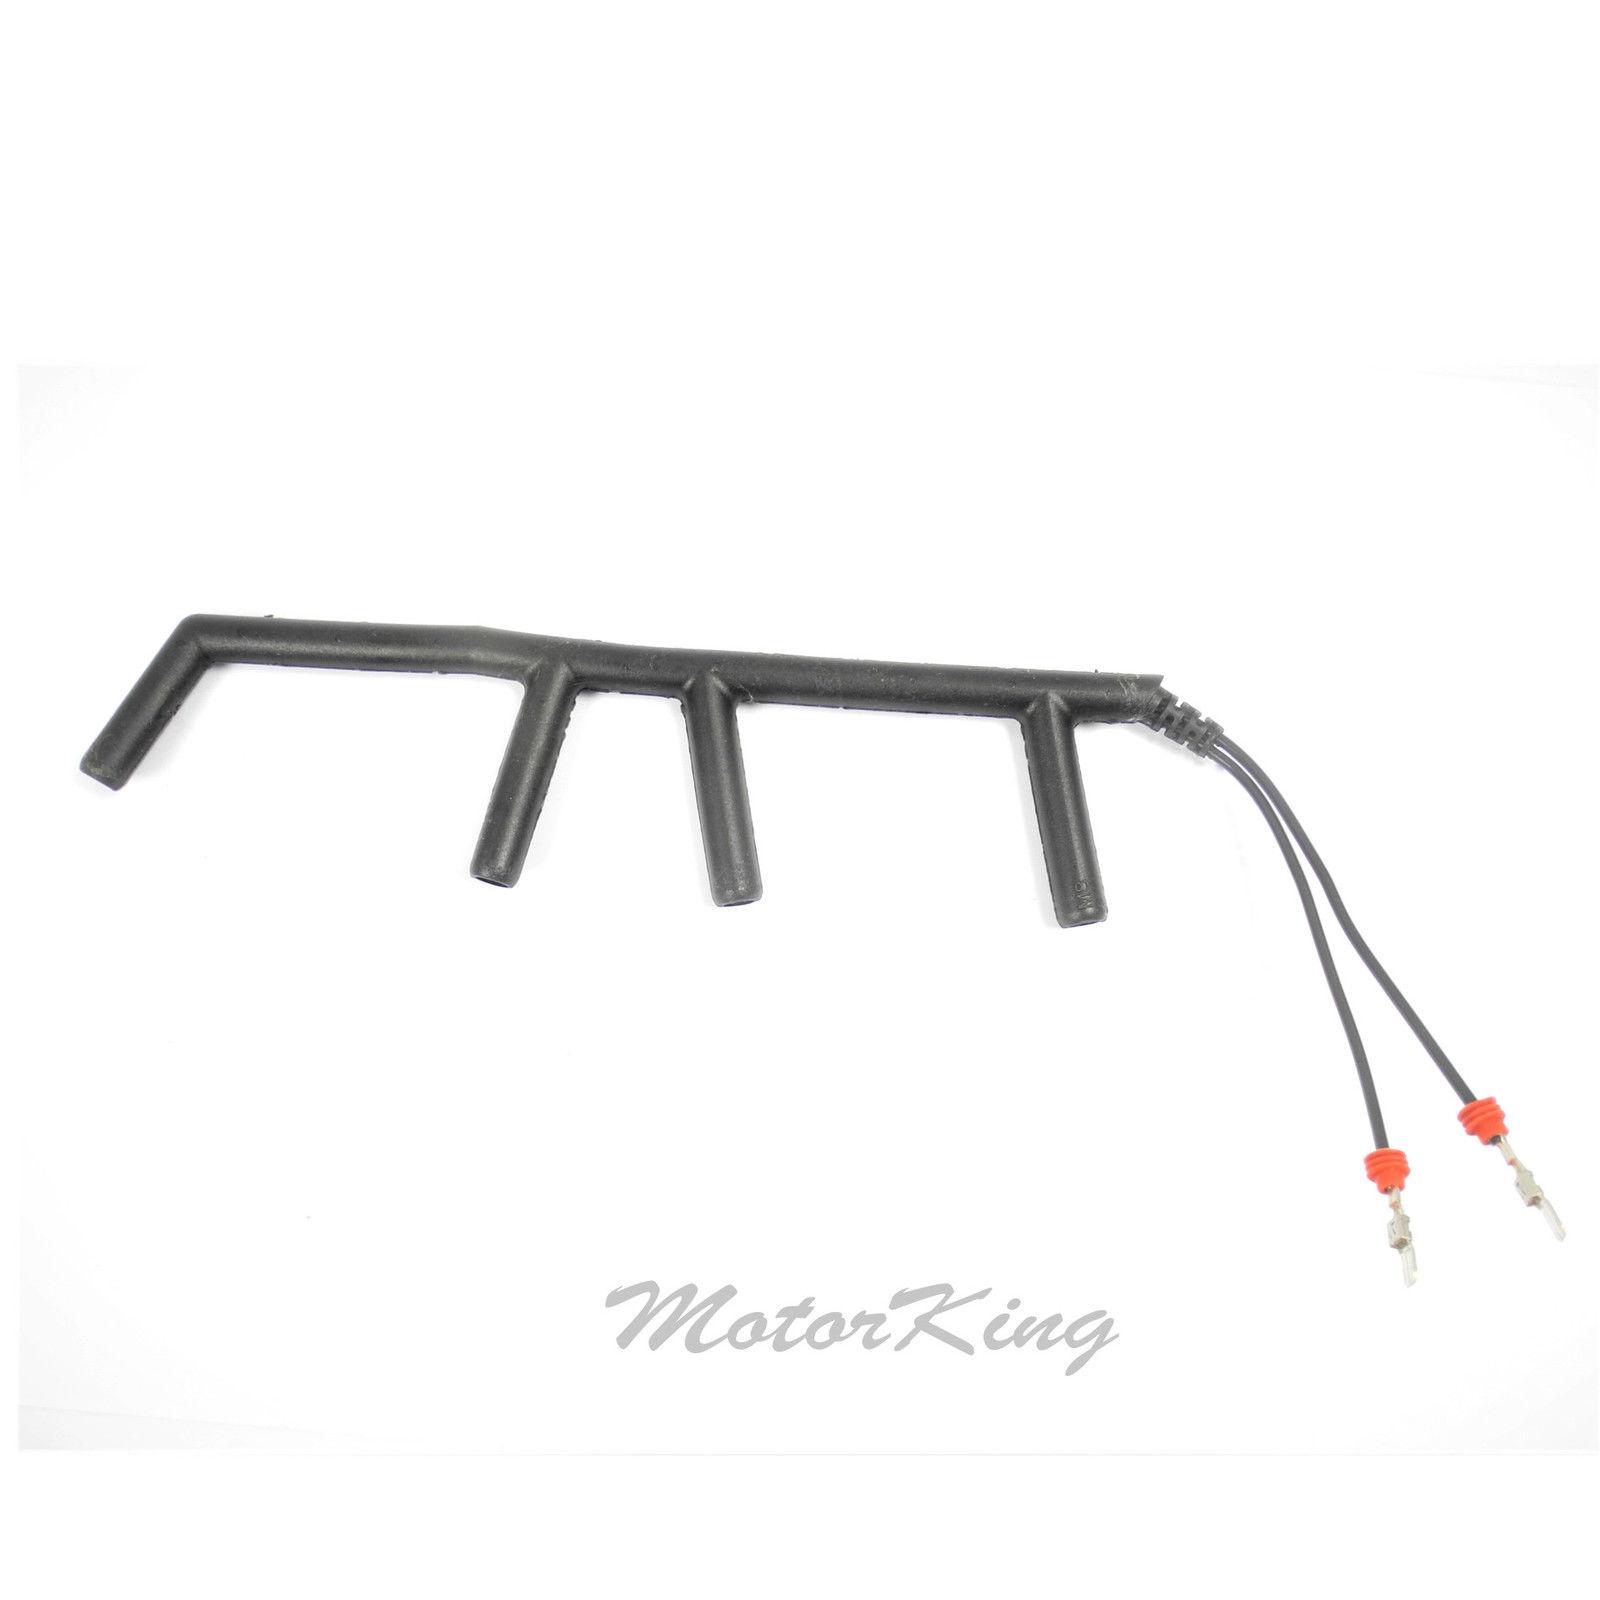 For VW Beetle Golf Jetta Passat 1.9 2 Wire Glow Plug